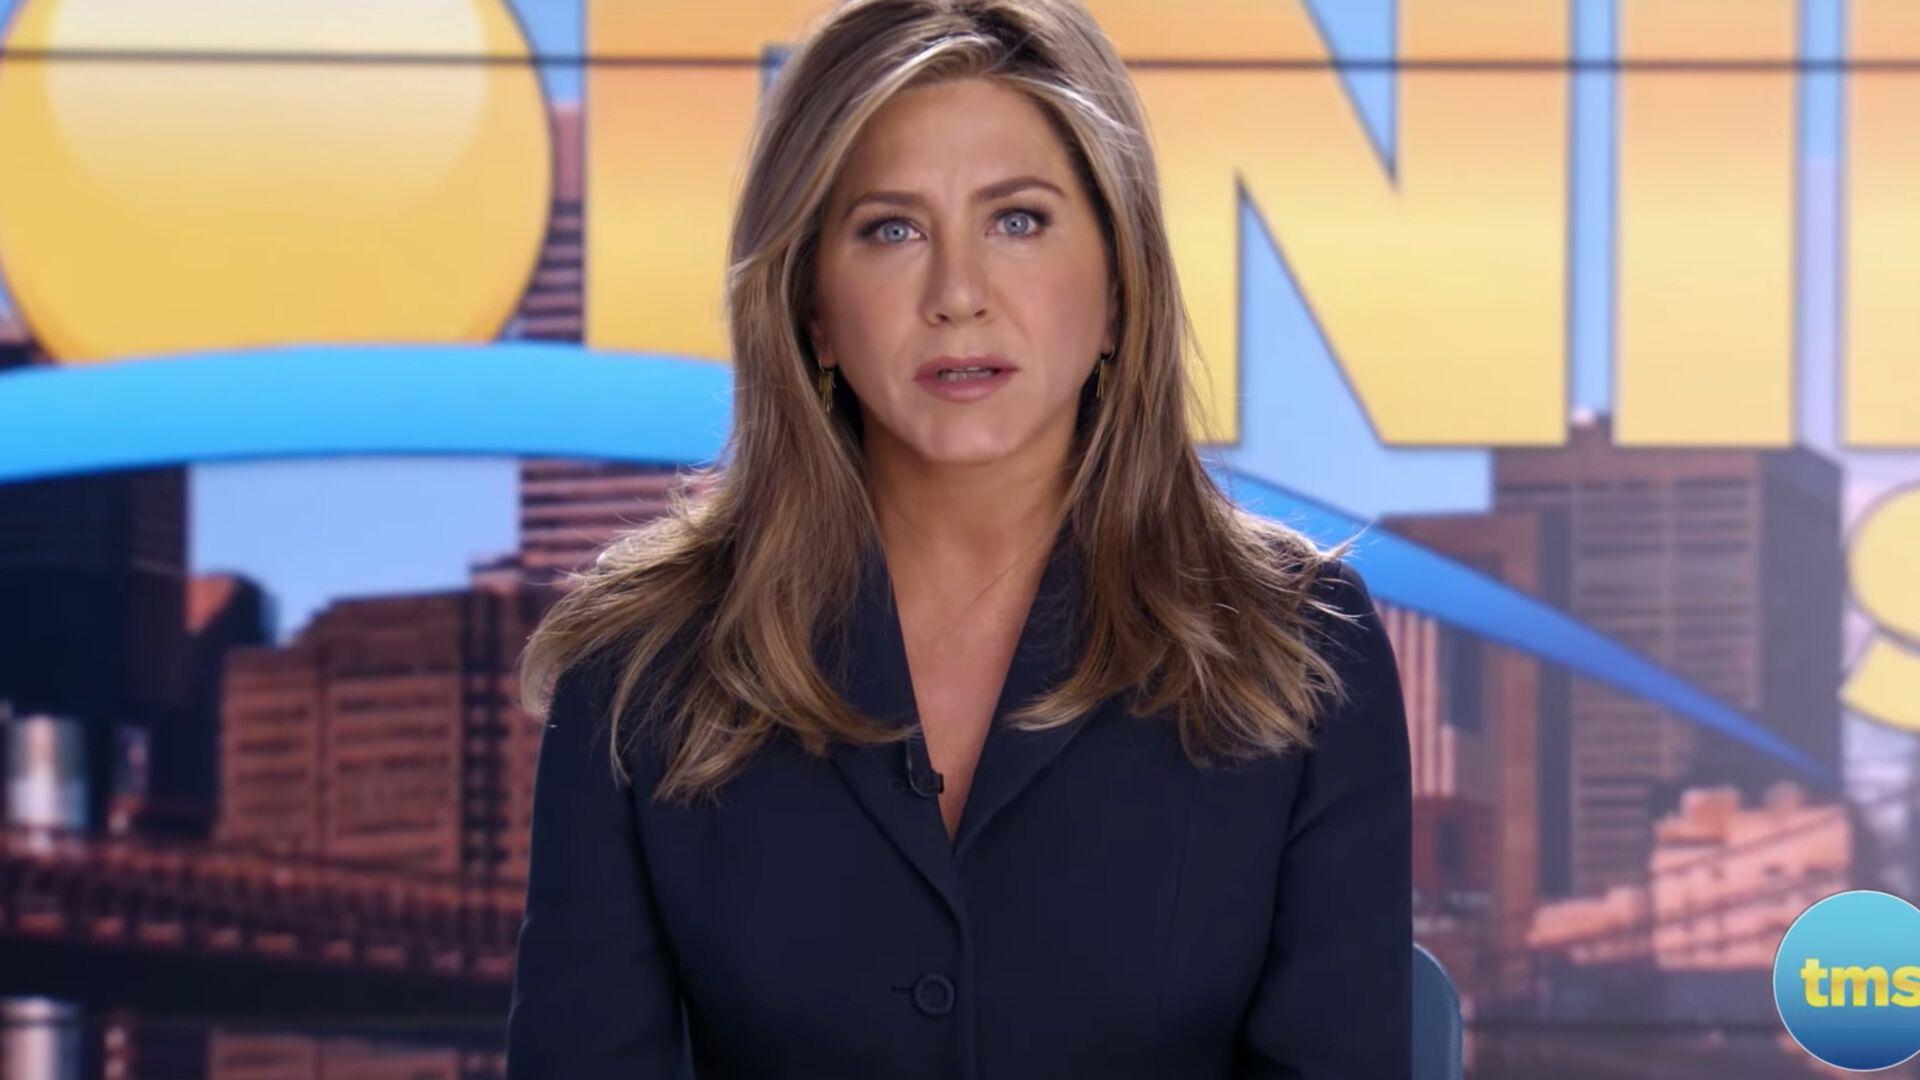 The Morning Show Jennifer Aniston sorozat appletv